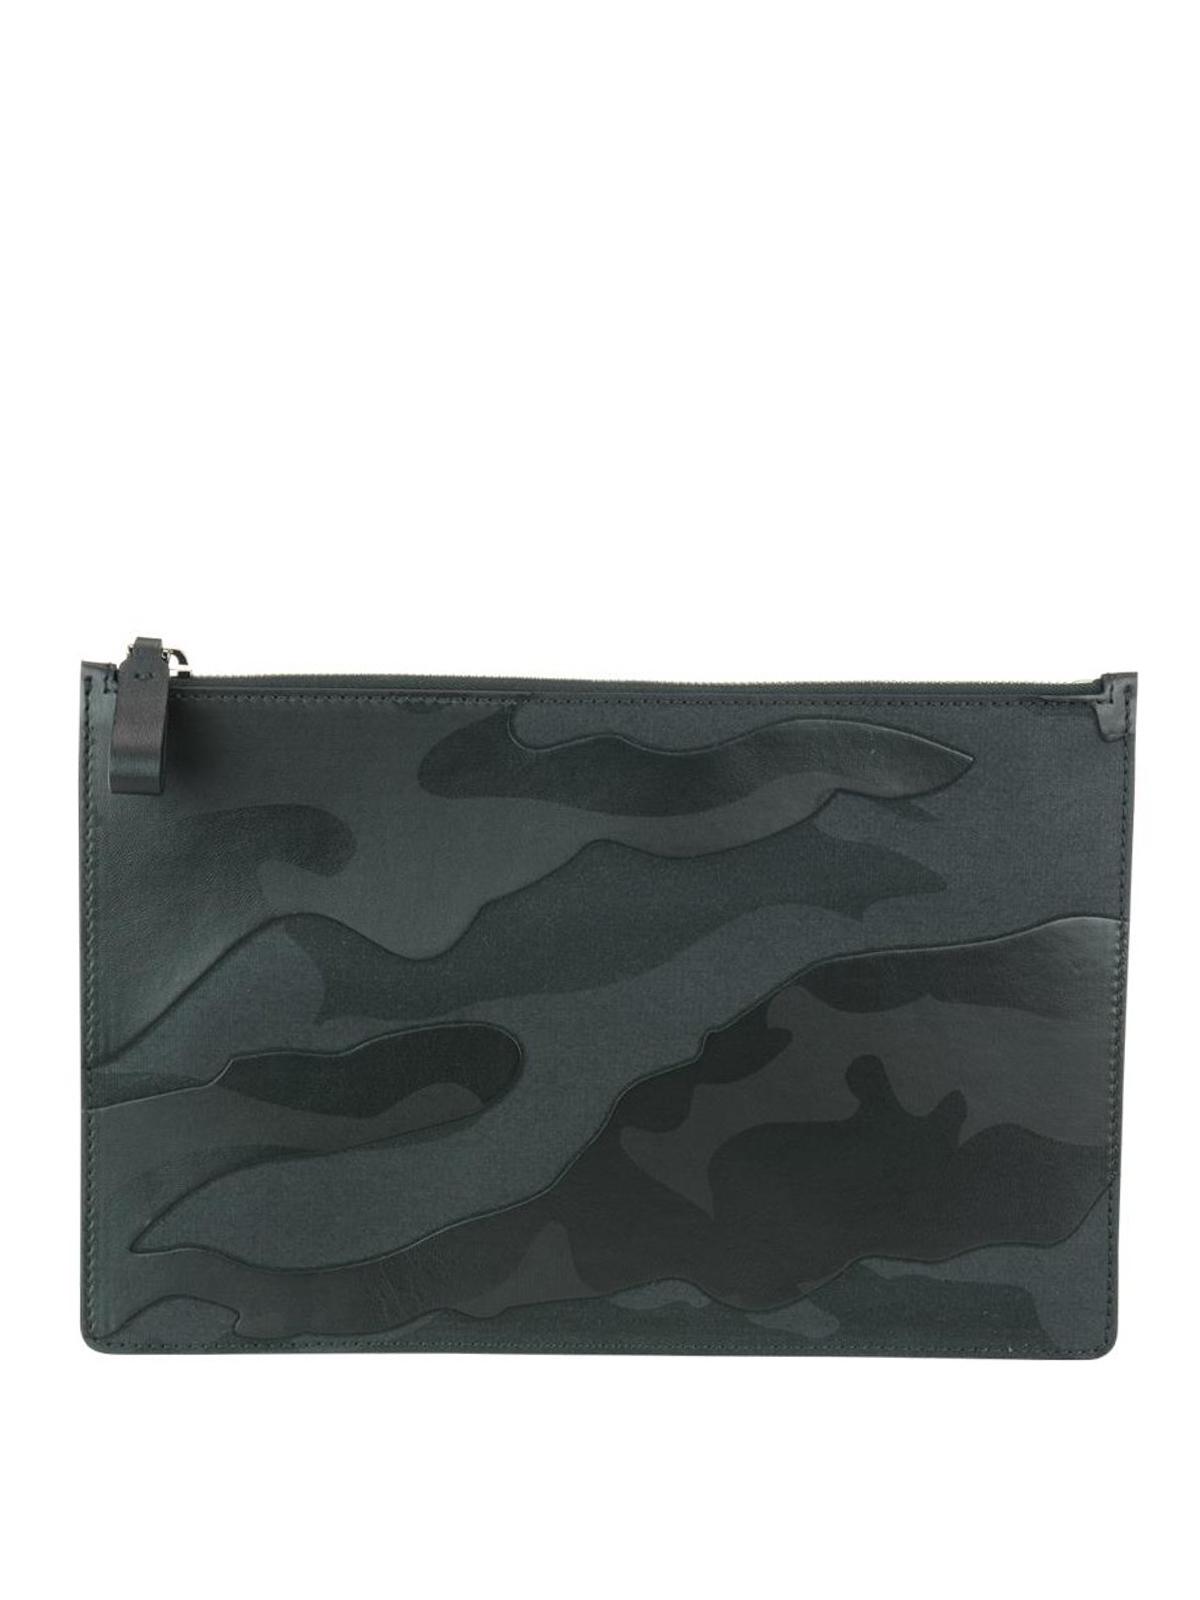 Valentino Camu leather and fabric clutch 4e3OyV